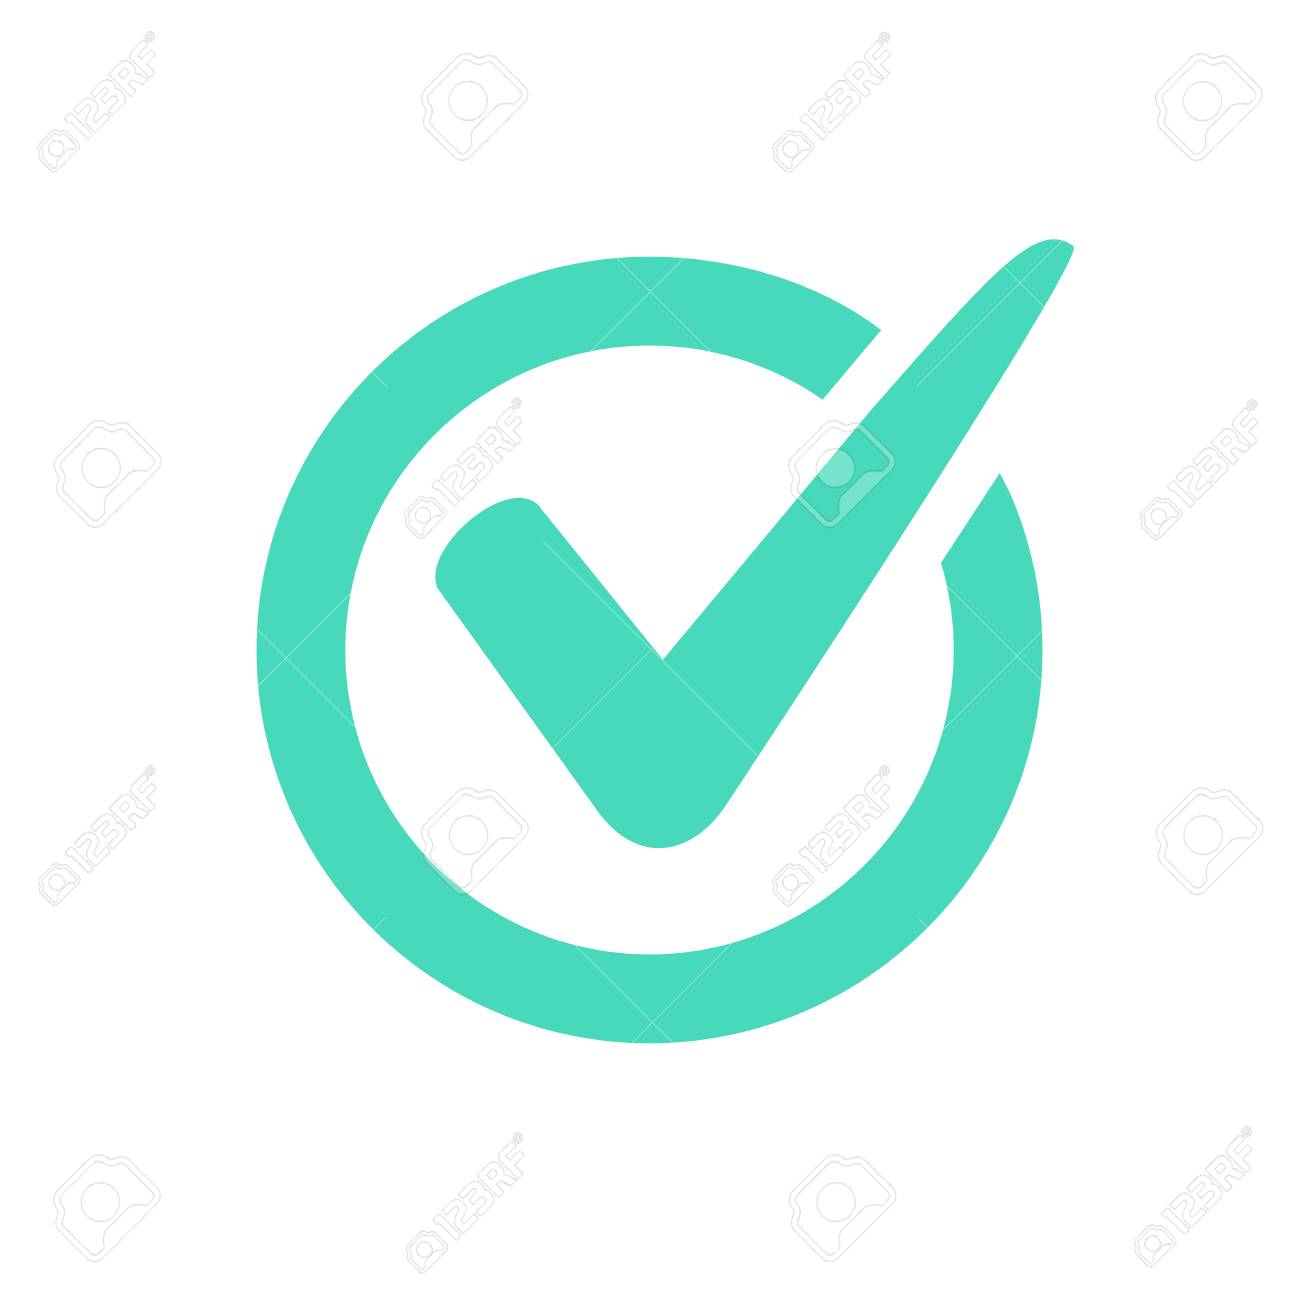 Check Mark Logo Vector Or Icon Tick Symbol In Green Color